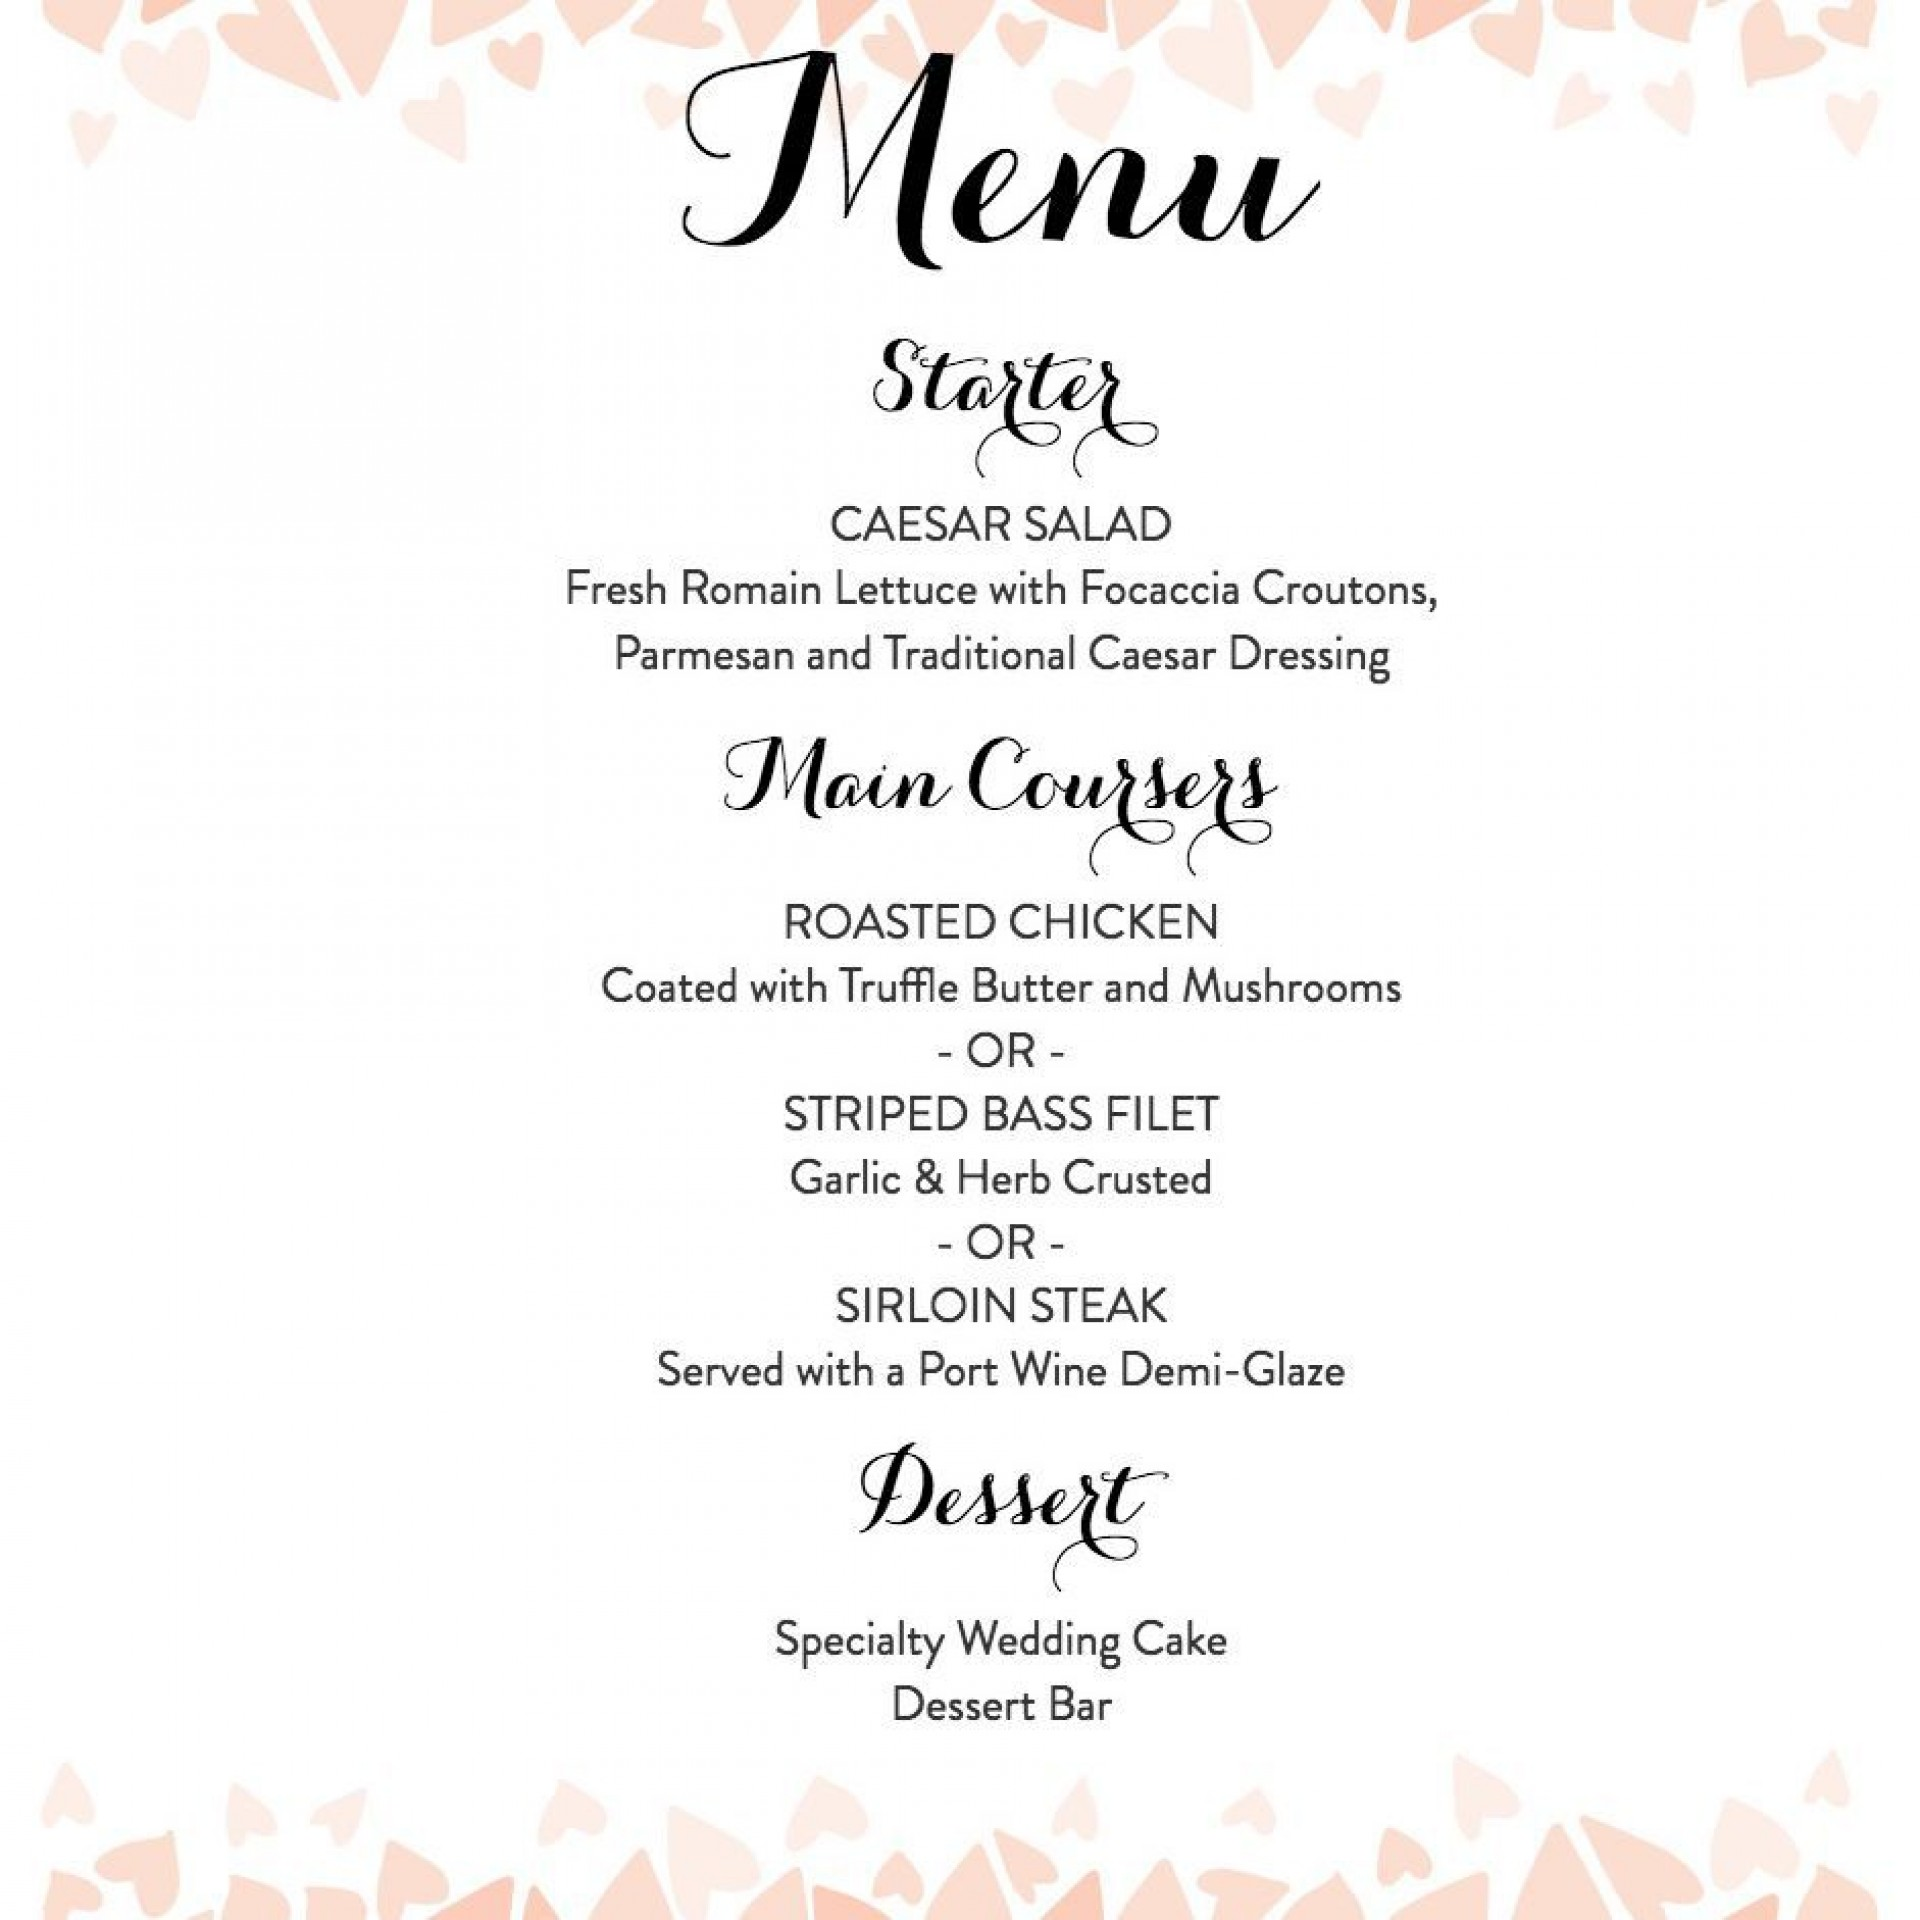 006 Impressive Elegant Wedding Menu Card Template Highest Quality  Templates1920